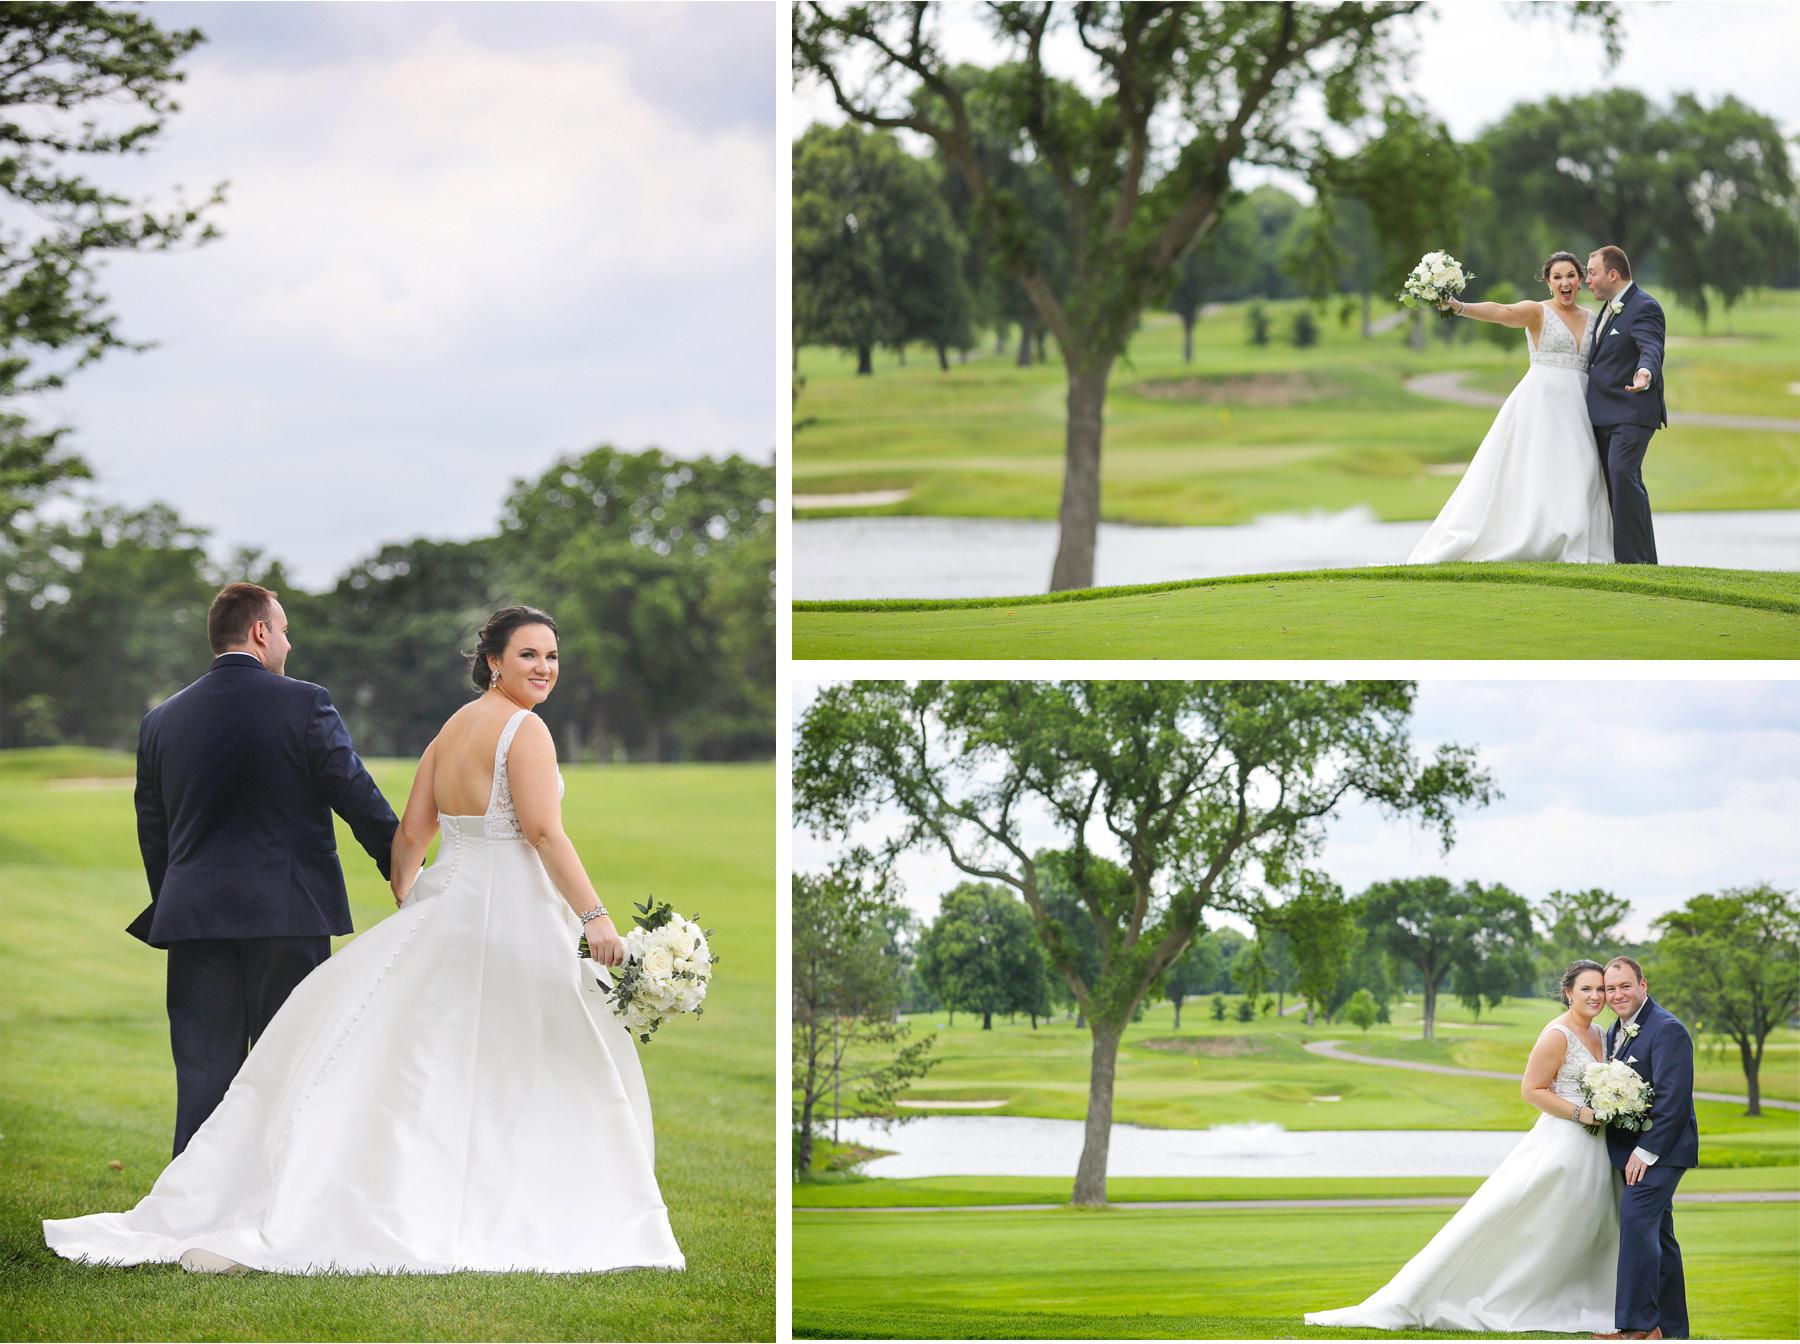 17-Vick-Photography-Wedding-Minneapolis-Minnesota-Edina-Country-Club-Reception-Bride-Groom-Erin-and-David.jpg